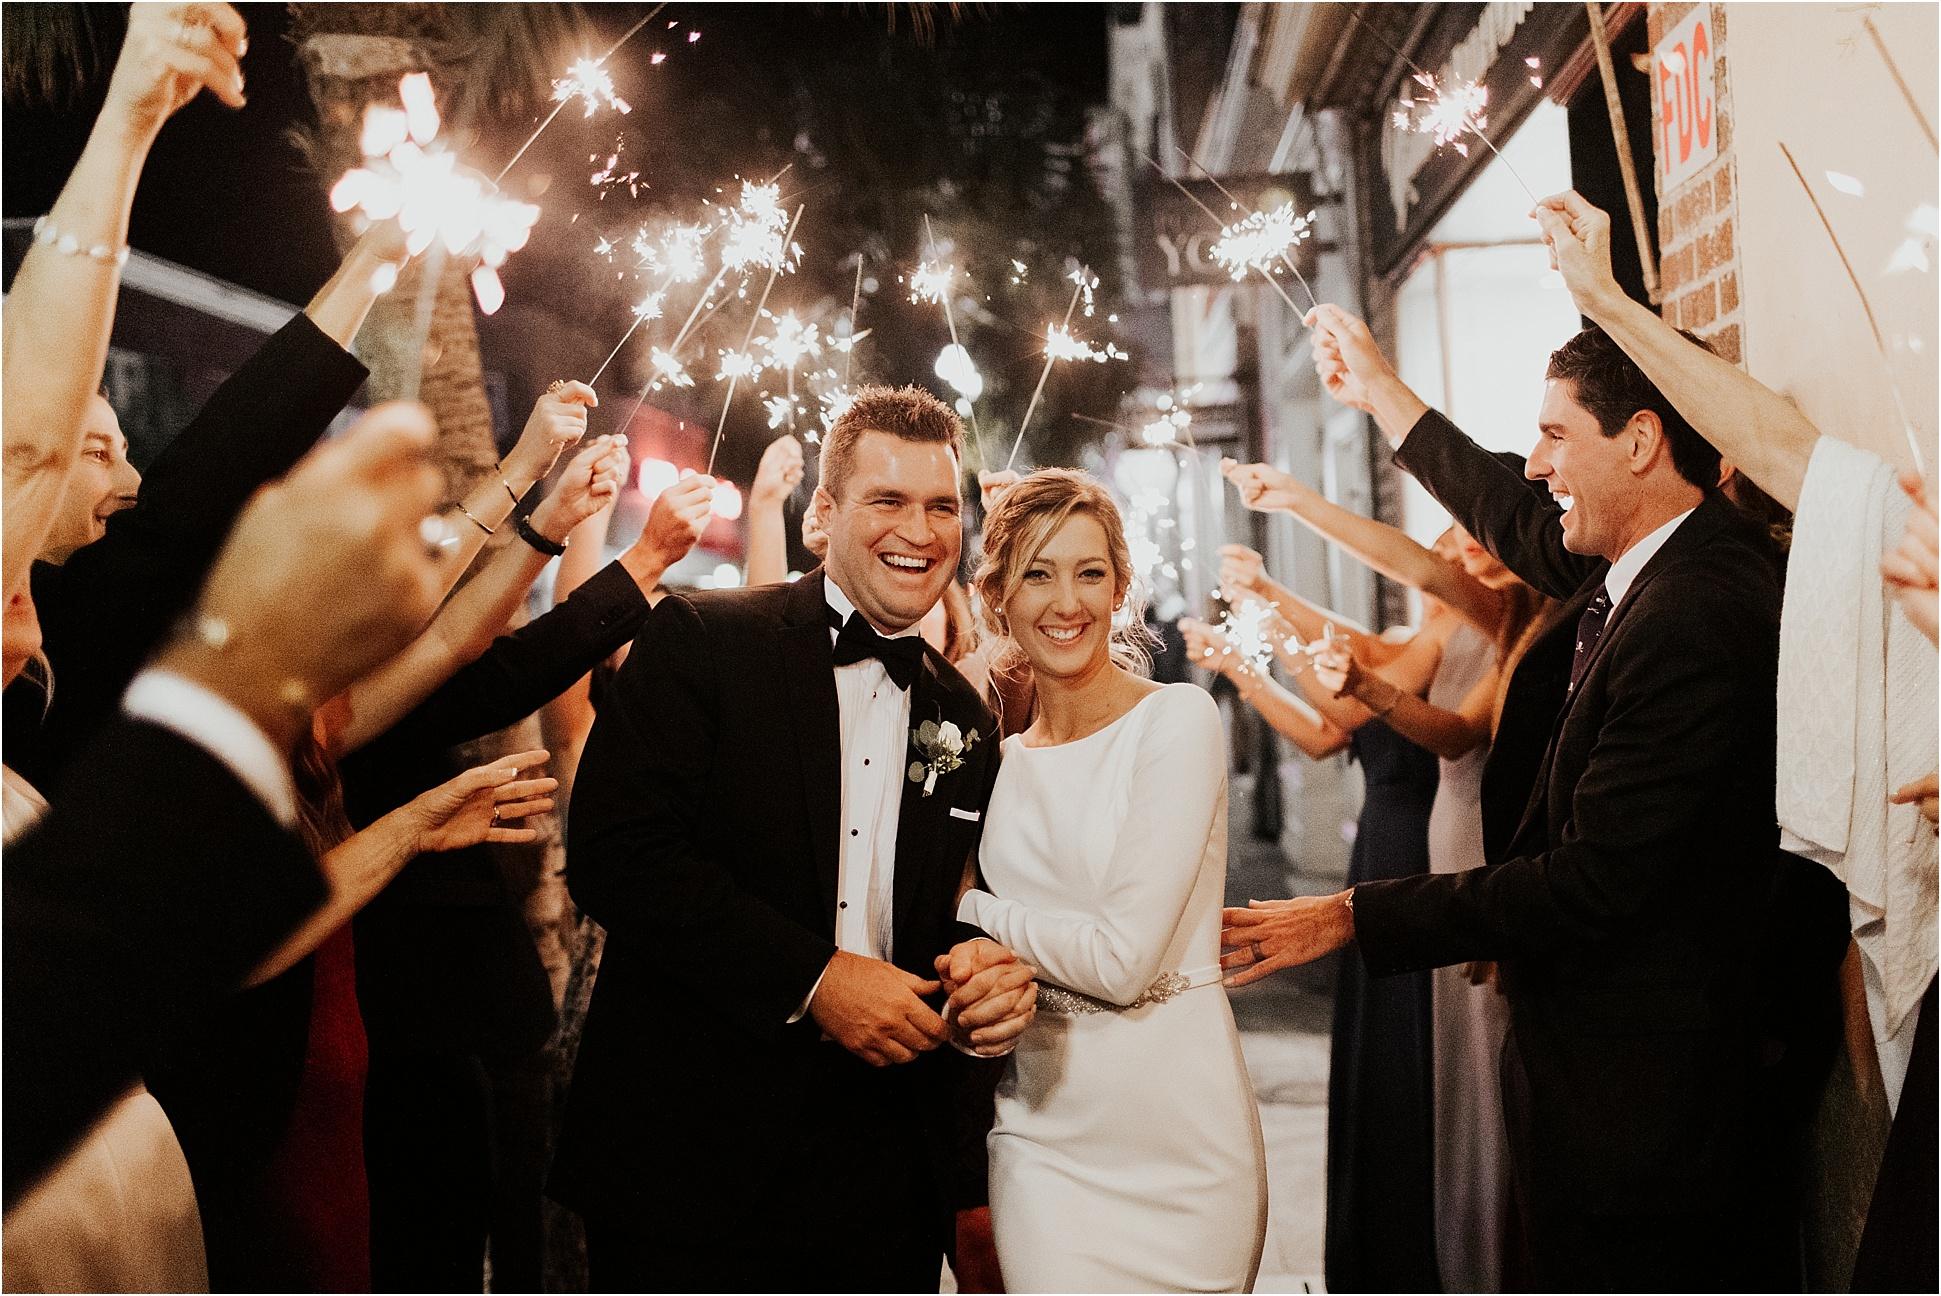 upstairs_midtown_intimate_charleston_wedding090.JPG